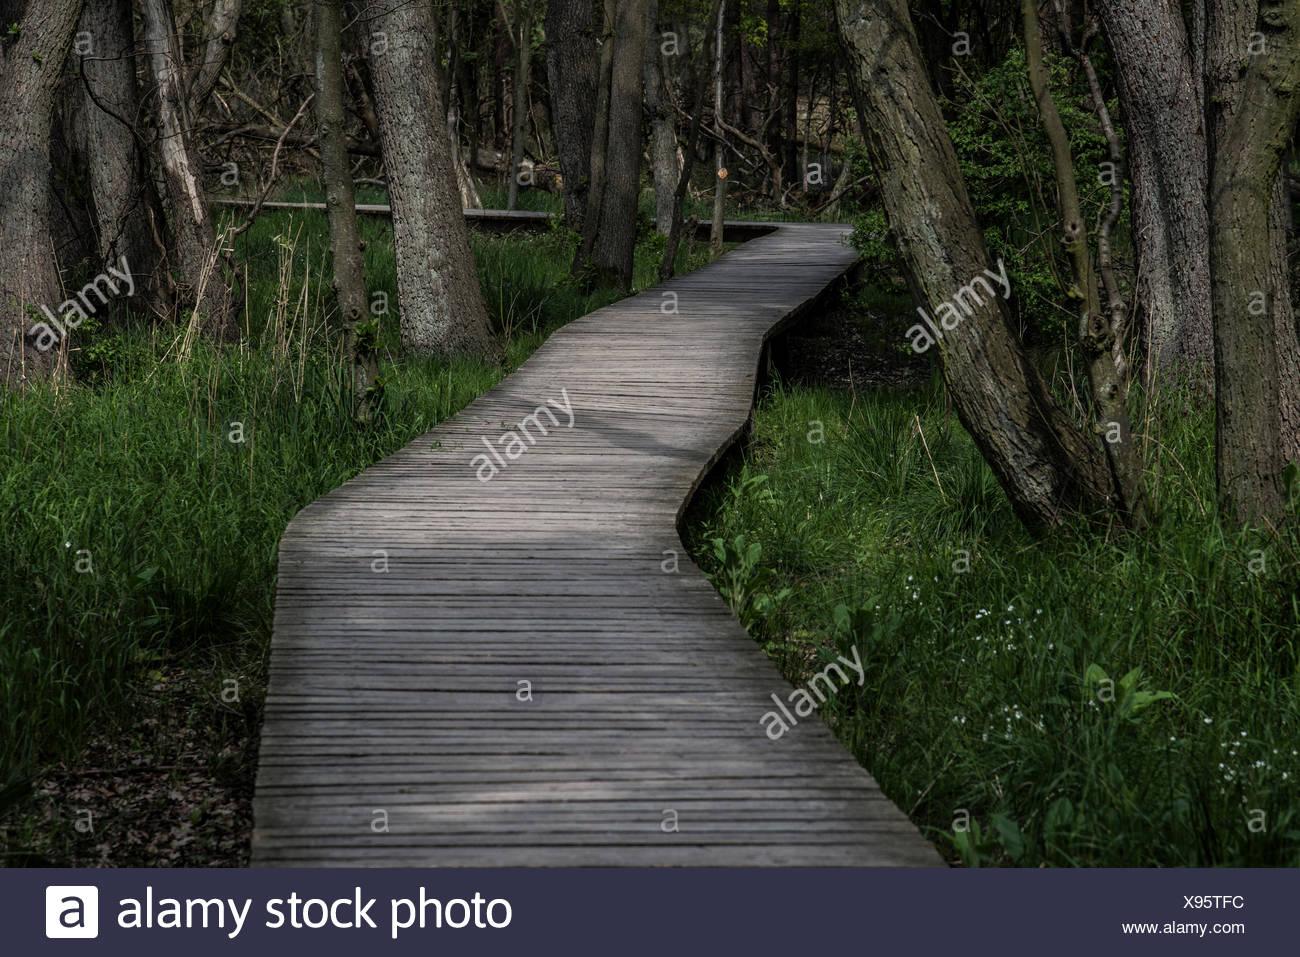 Boardwalk through the forest, Born am Darß, Fischland-Darß-Zingst, Mecklenburg-Western Pomerania, Germany - Stock Image